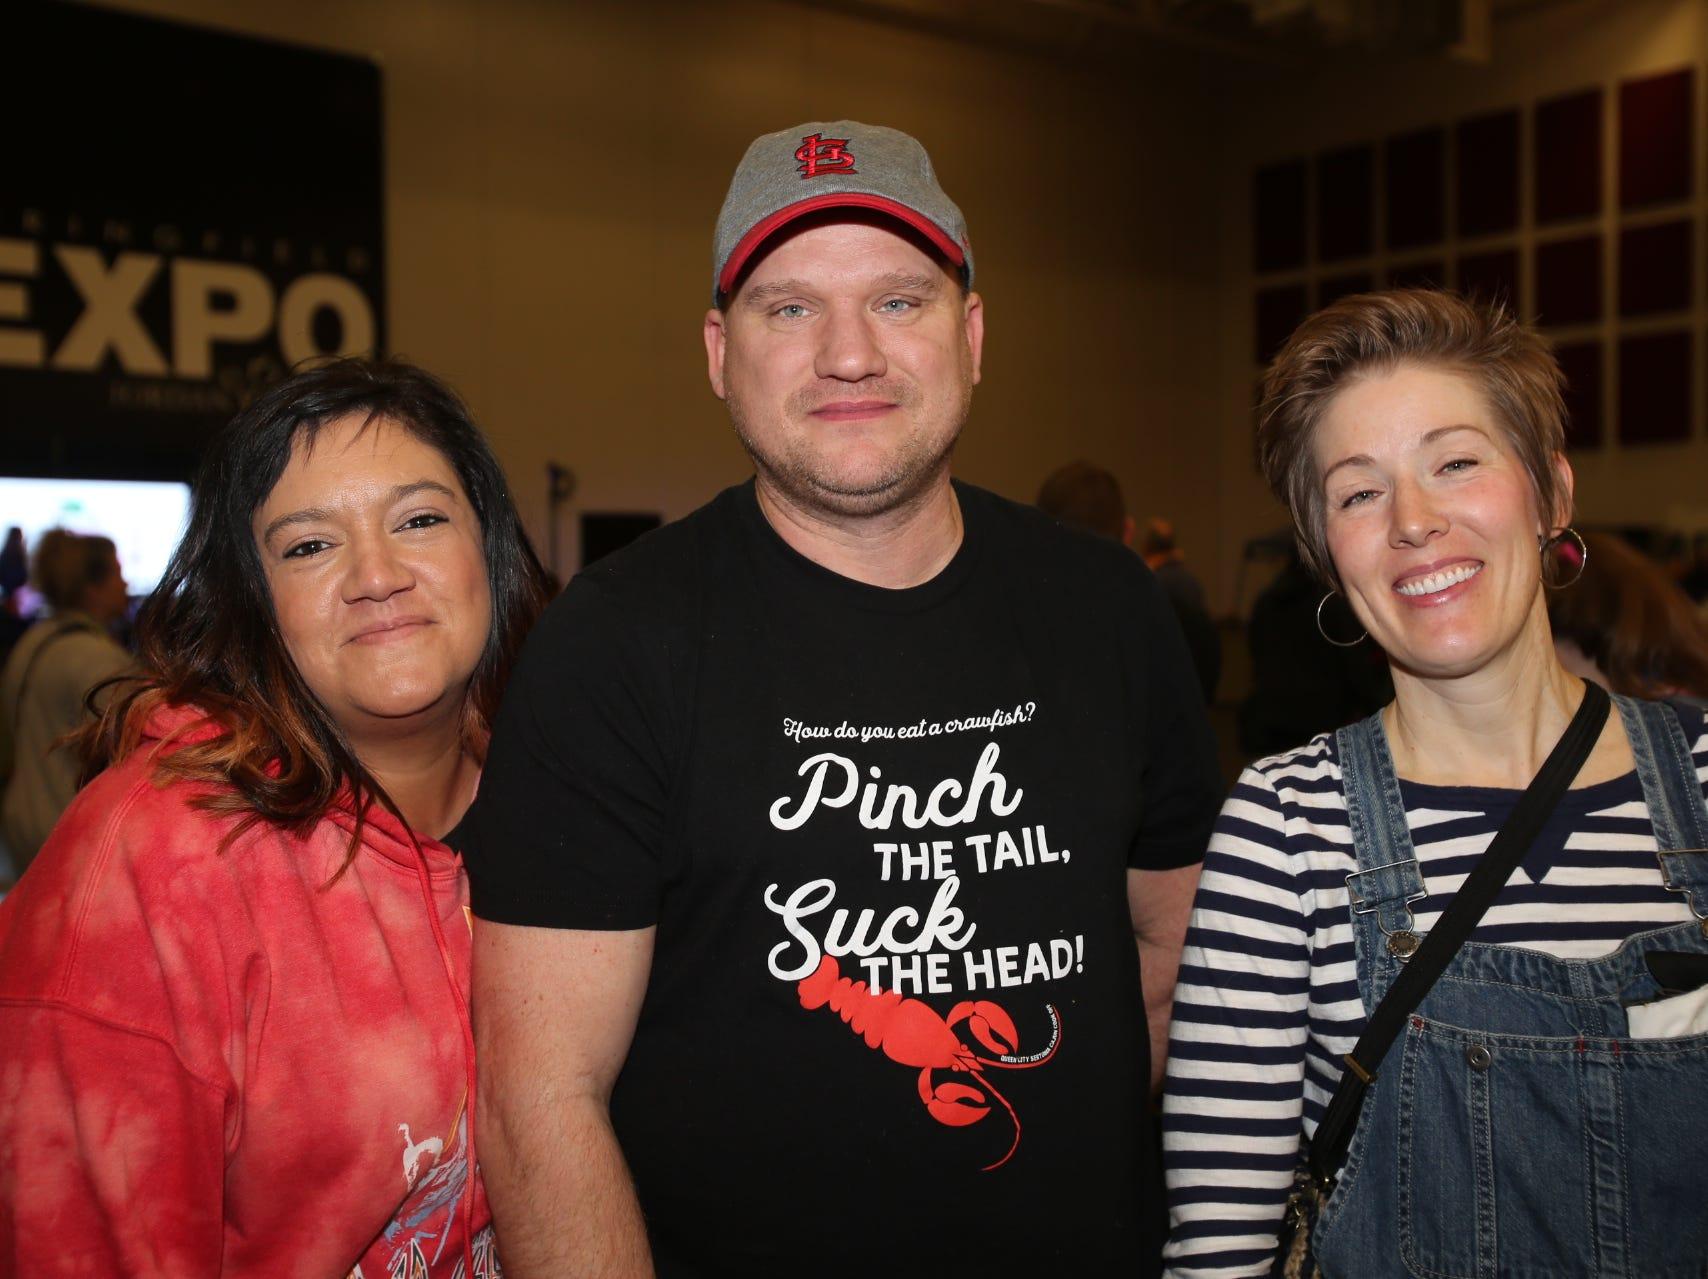 Tara, Robert, and Michelle Eiken